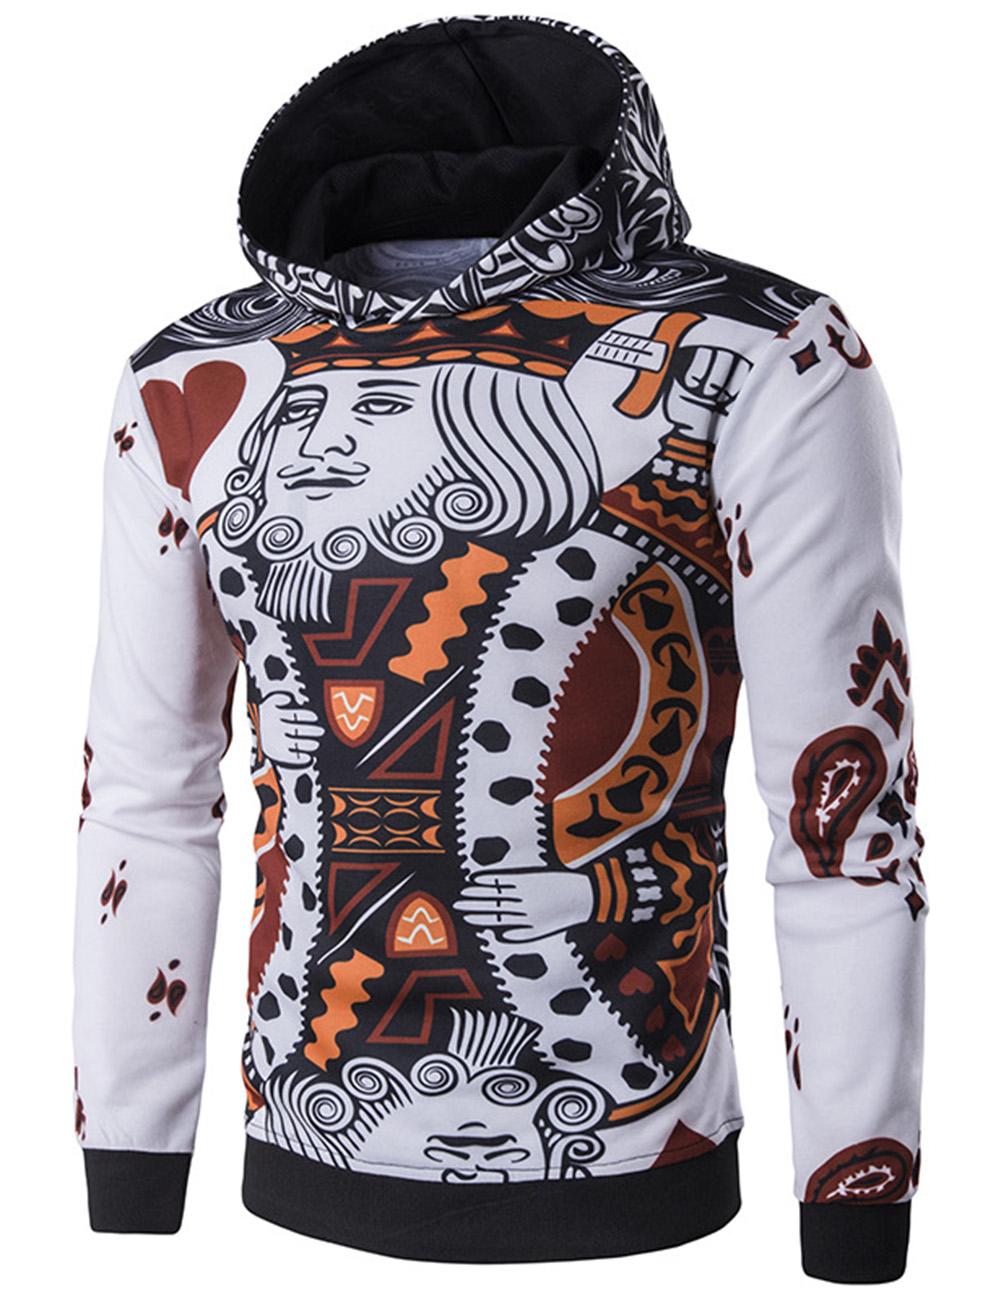 Men's Fashion 3D Playing Cards Poker Printing Pullover Hoodie Sweatshirts